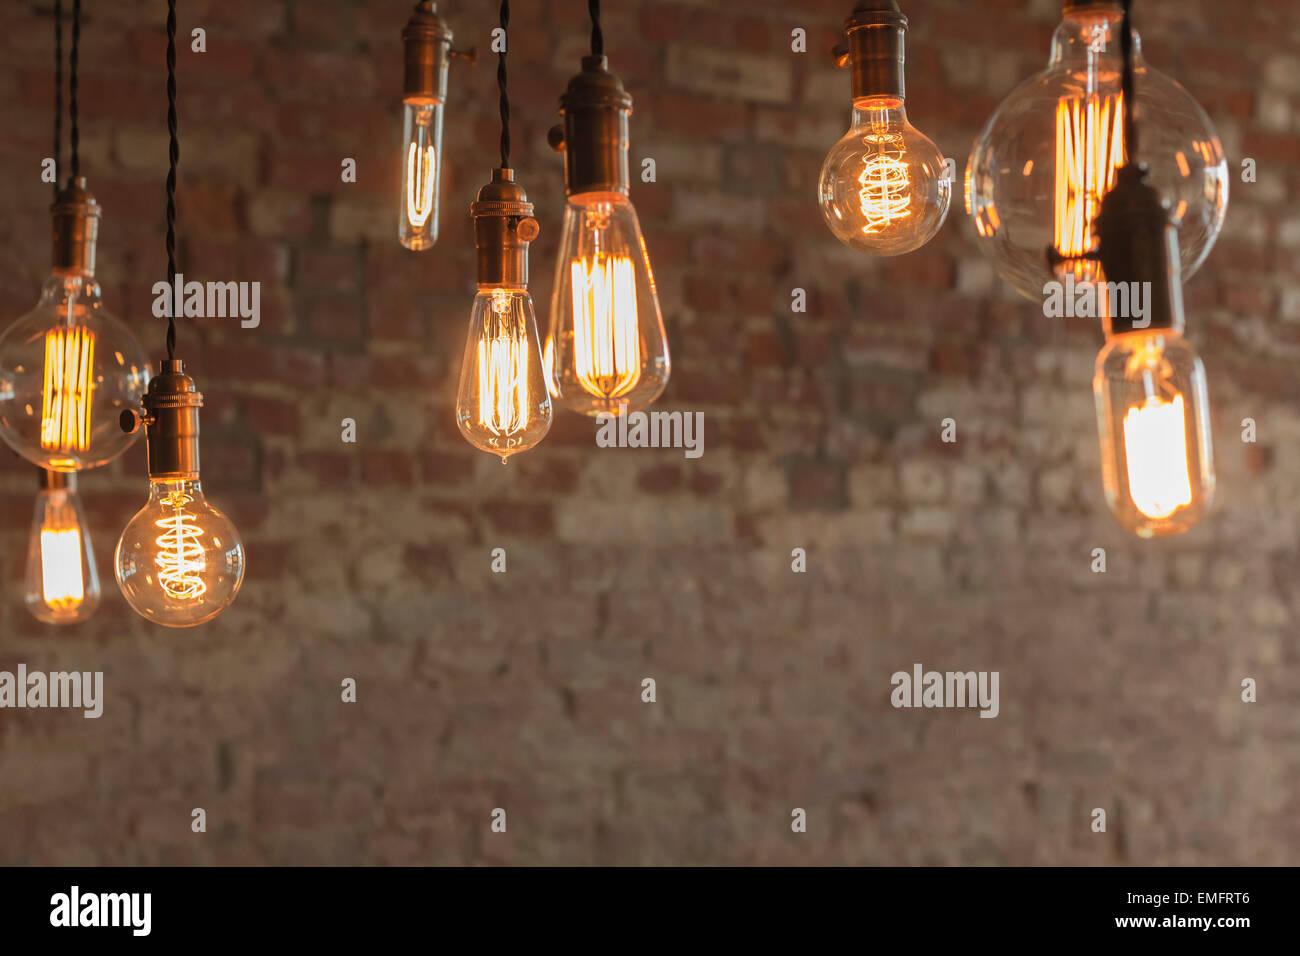 Decorative antique edison style light bulbs against brick wall stock decorative antique edison style light bulbs against brick wall background aloadofball Images